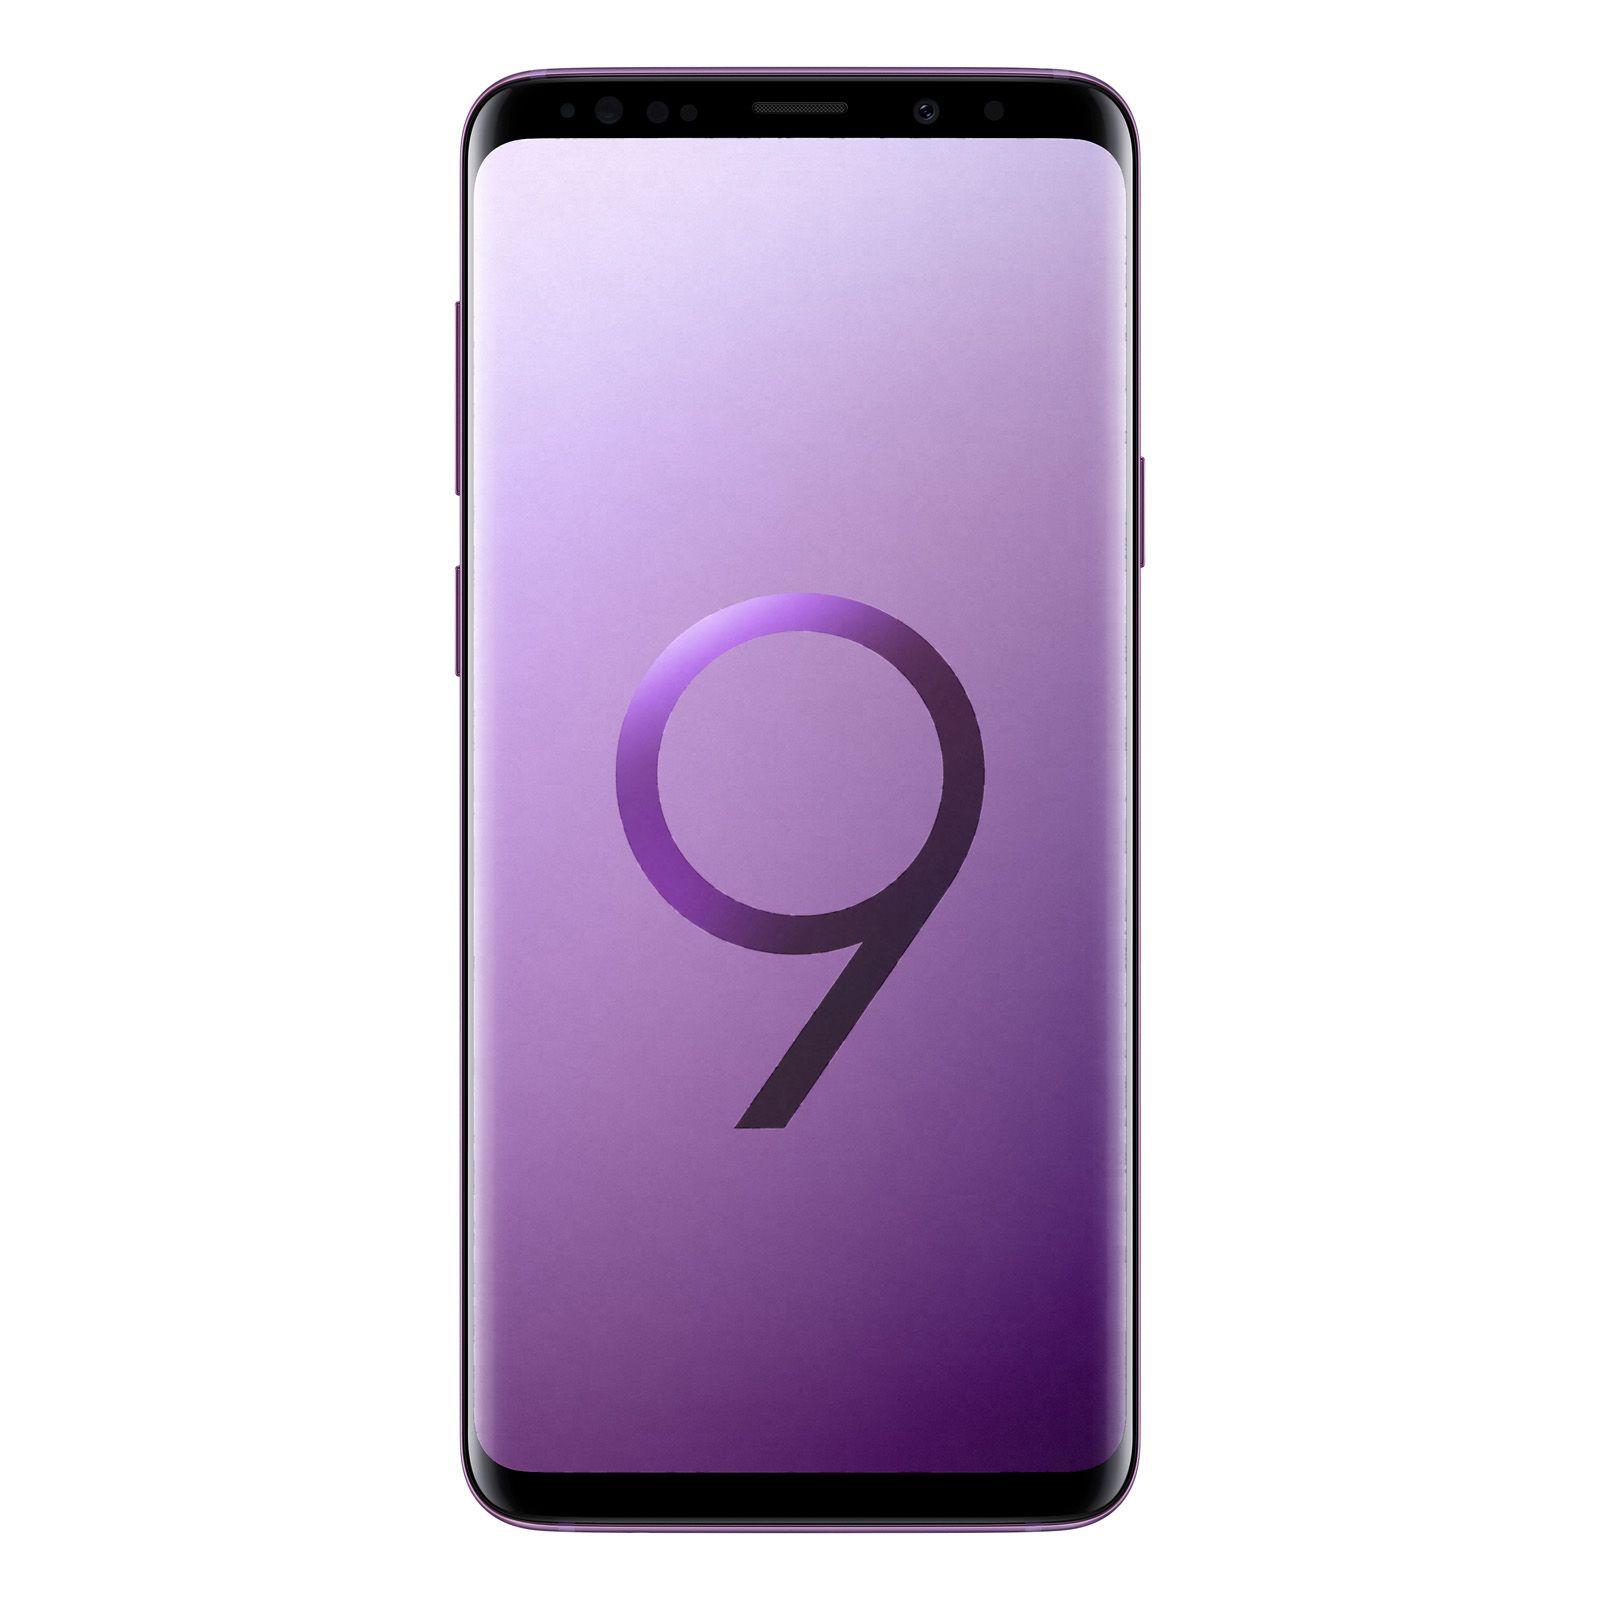 Telefon Mobil Samsung Galaxy S9 Plus G965F 64GB Flash 6GB RAM Dual SIM 4G Lilac Purple